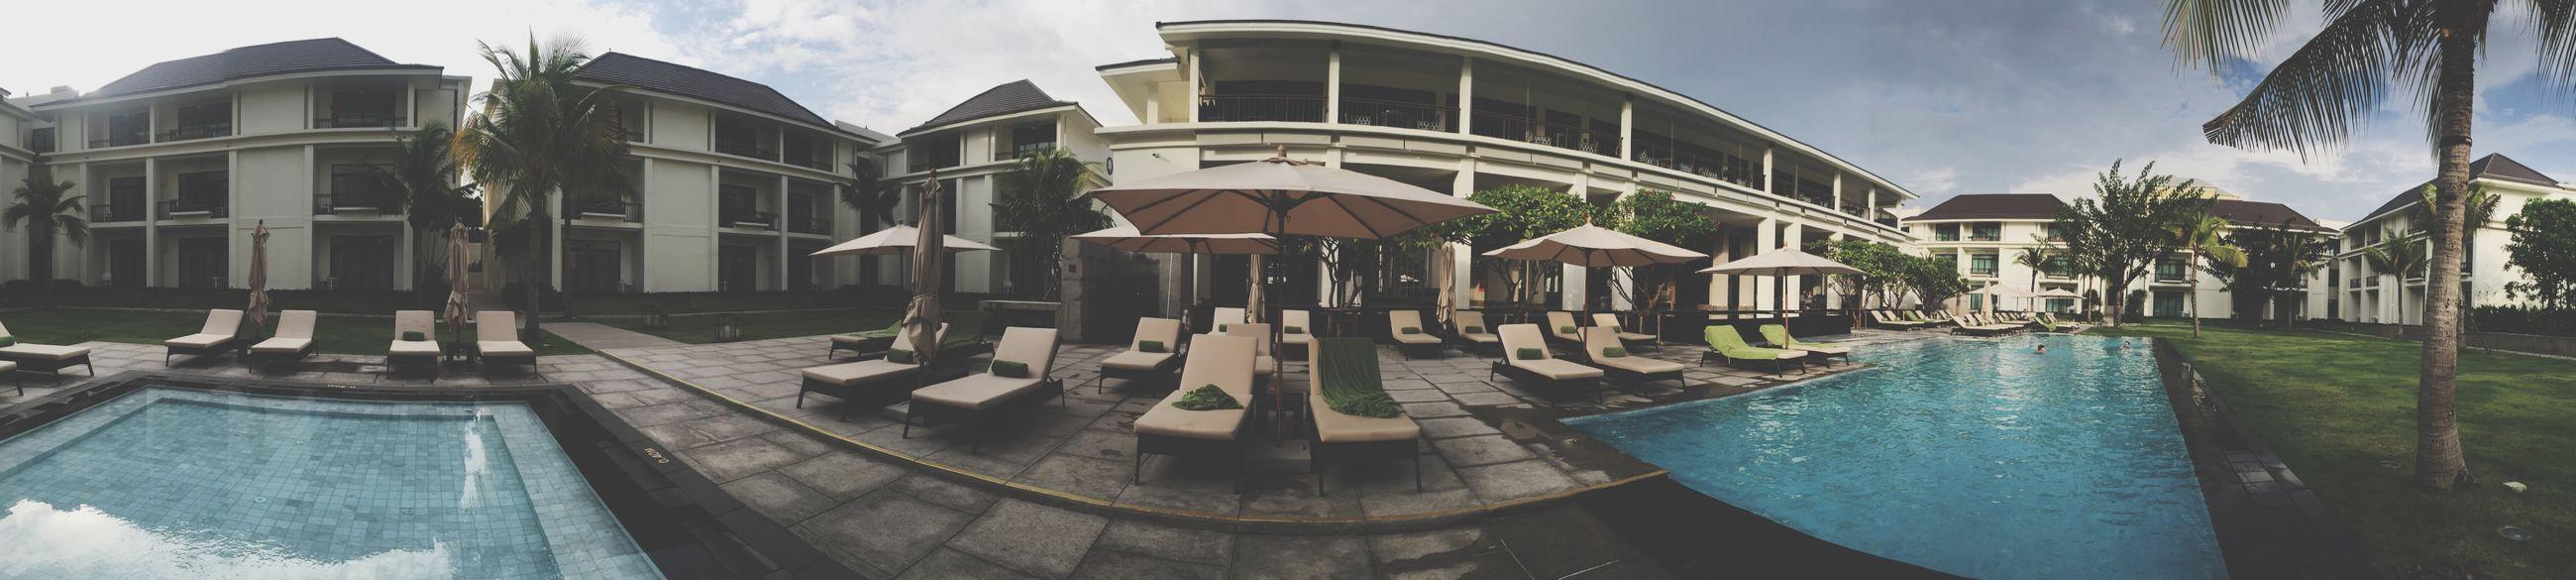 U Sathorn Bangkok Sathorn1 Ngamdupree Hotel Luxury 24hours Bangkokeater Hotel View Panorama